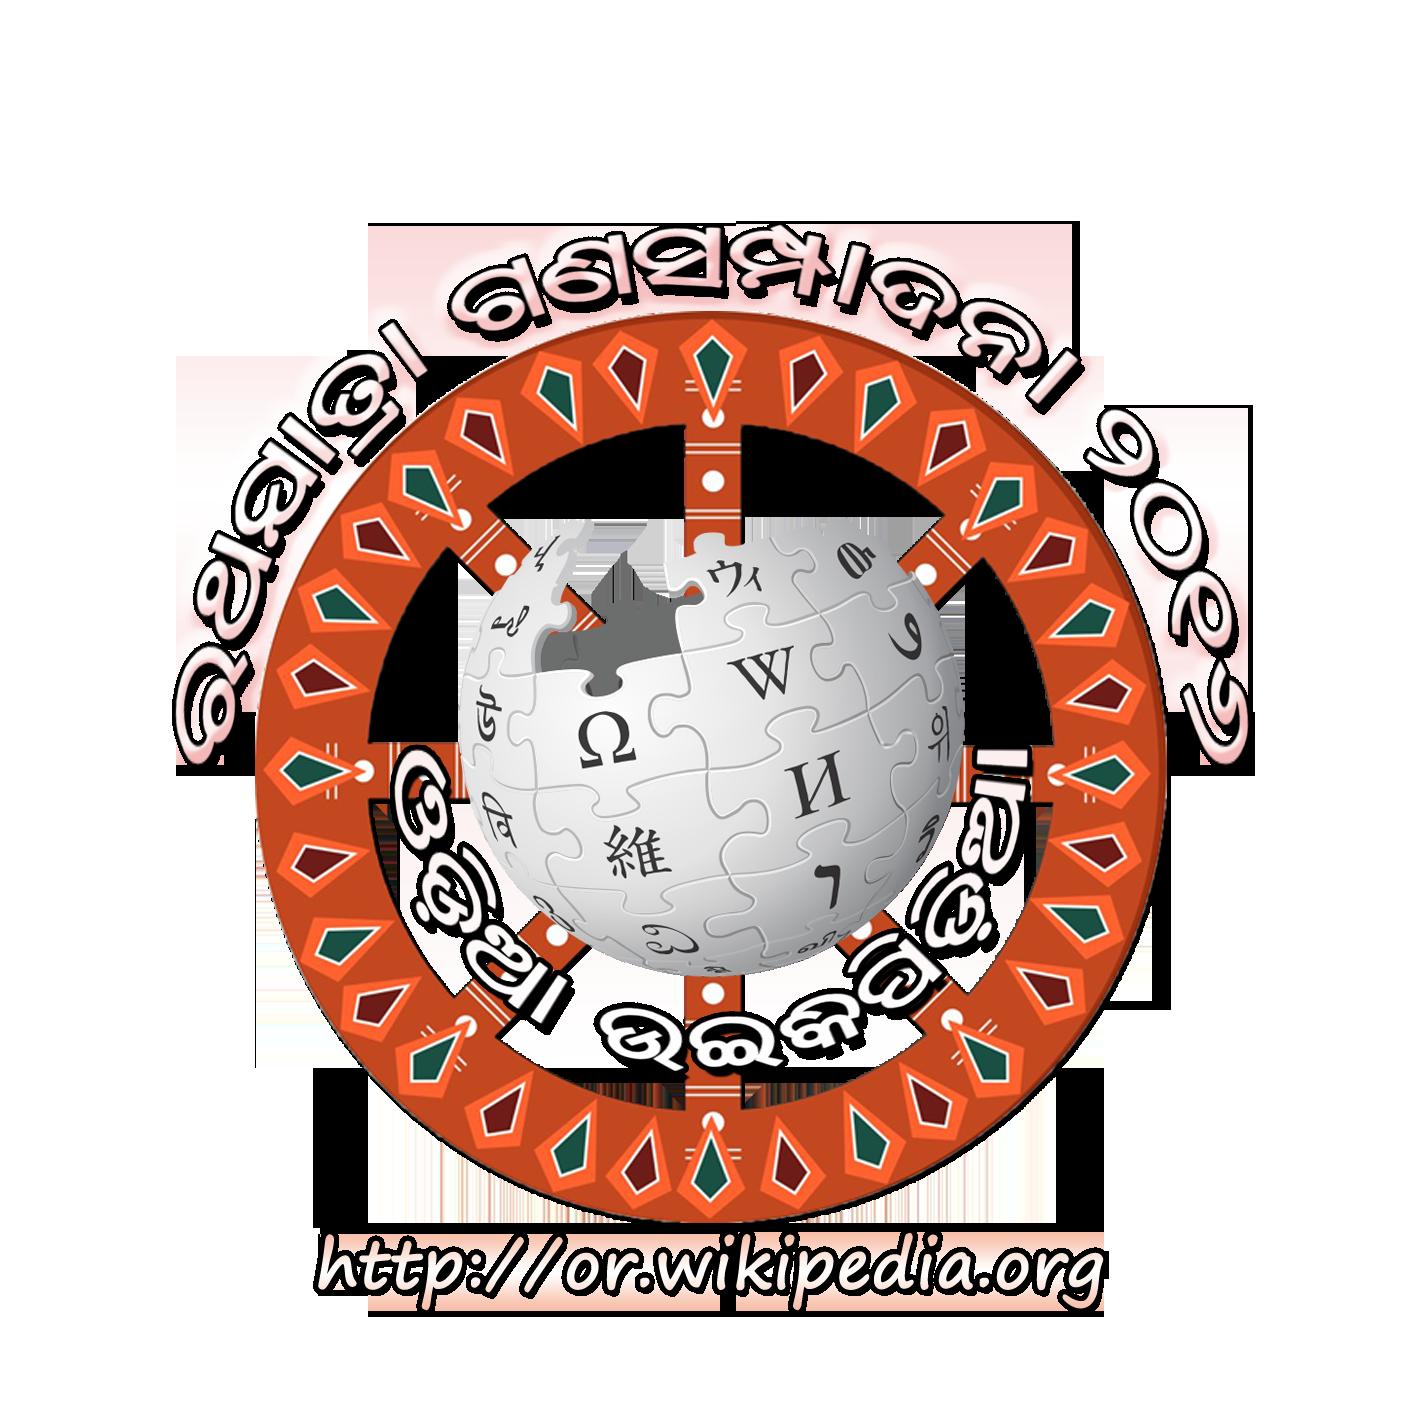 Odia_Rathajatra_Edit-a-thon_2016_logo